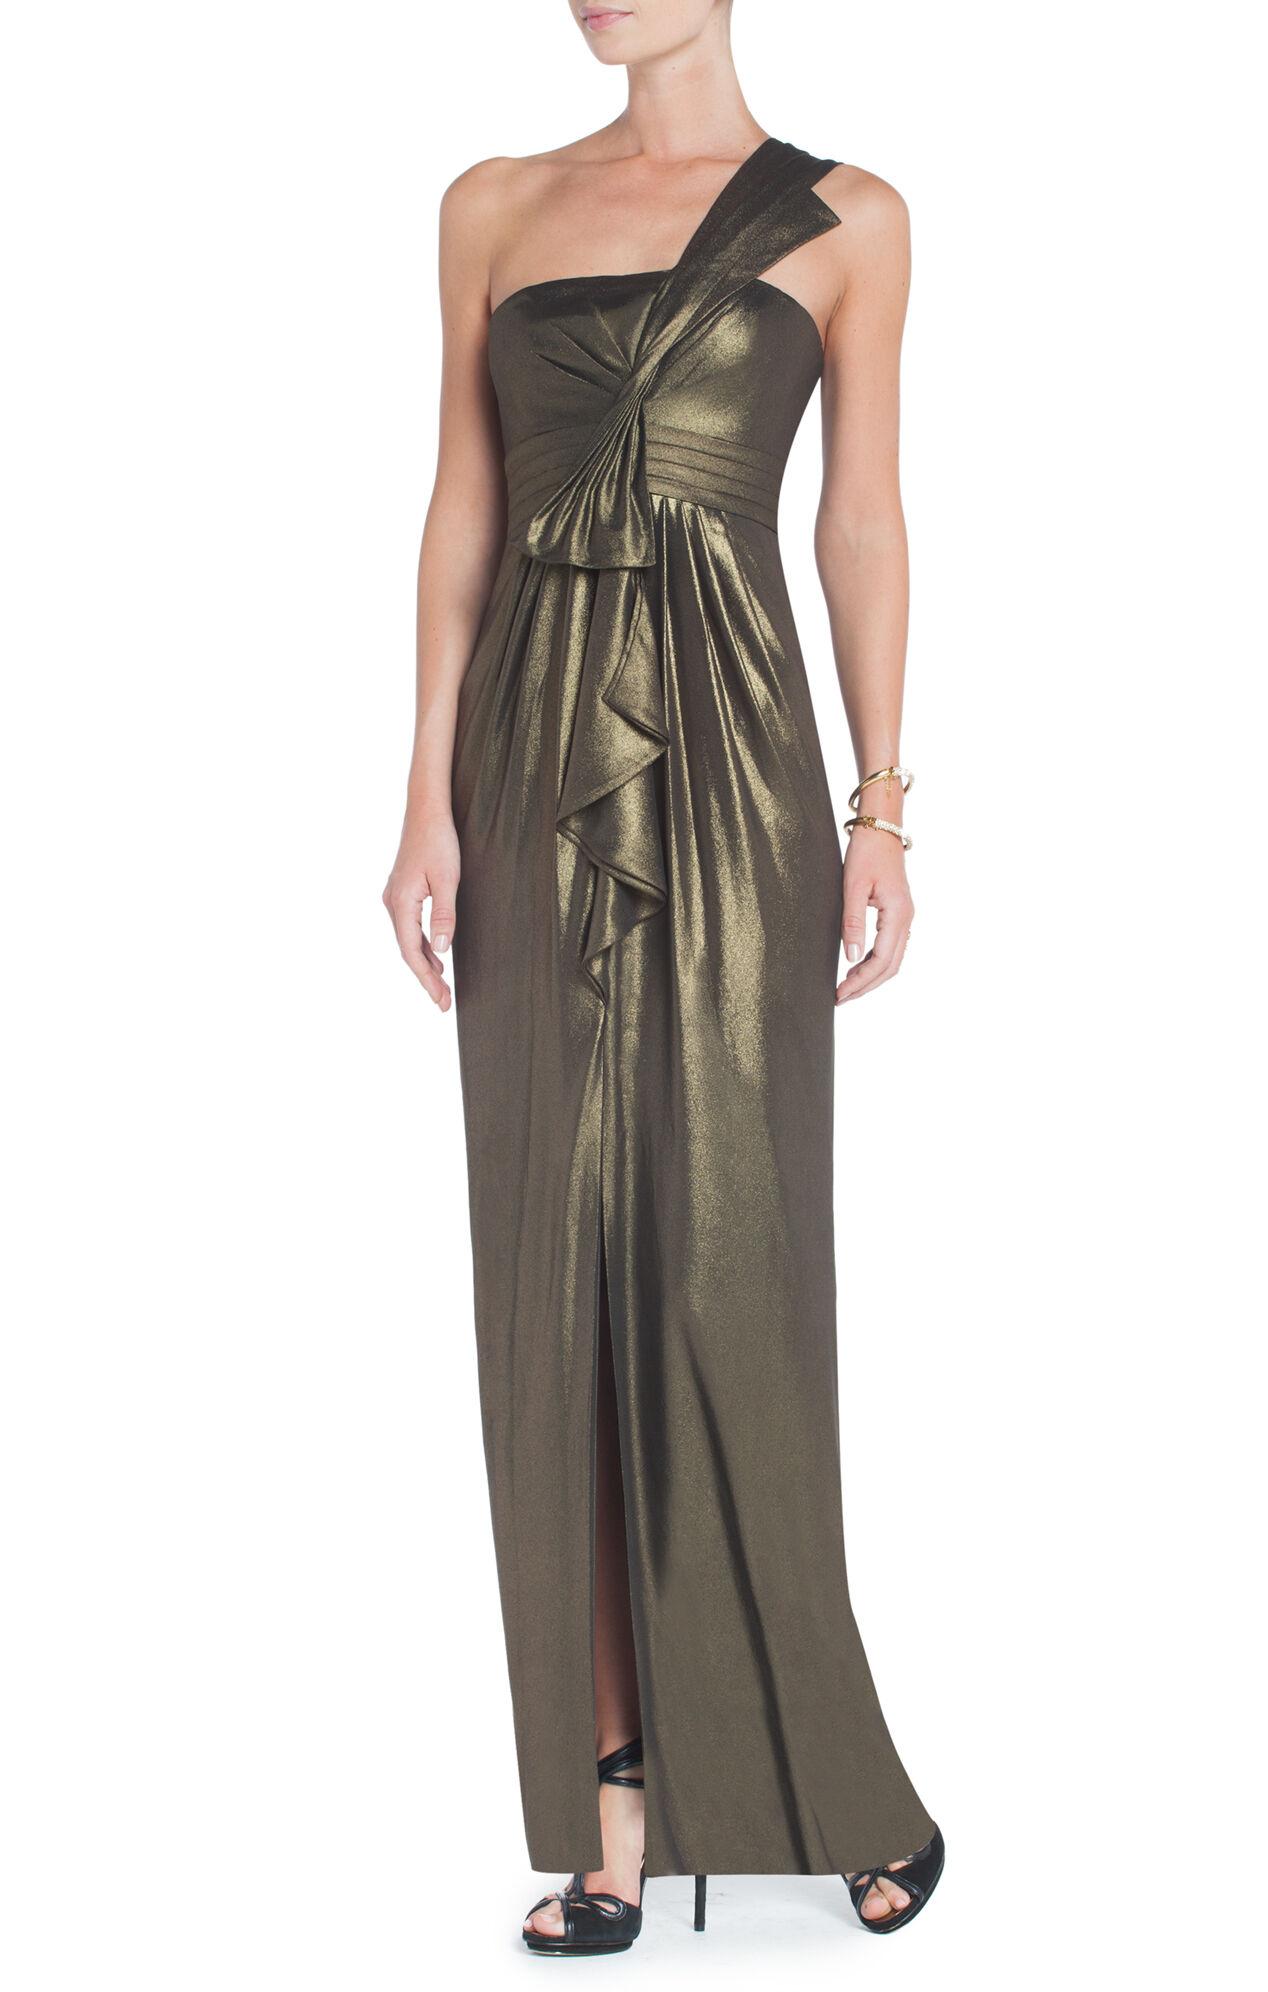 Barbara One-Shoulder Evening Gown